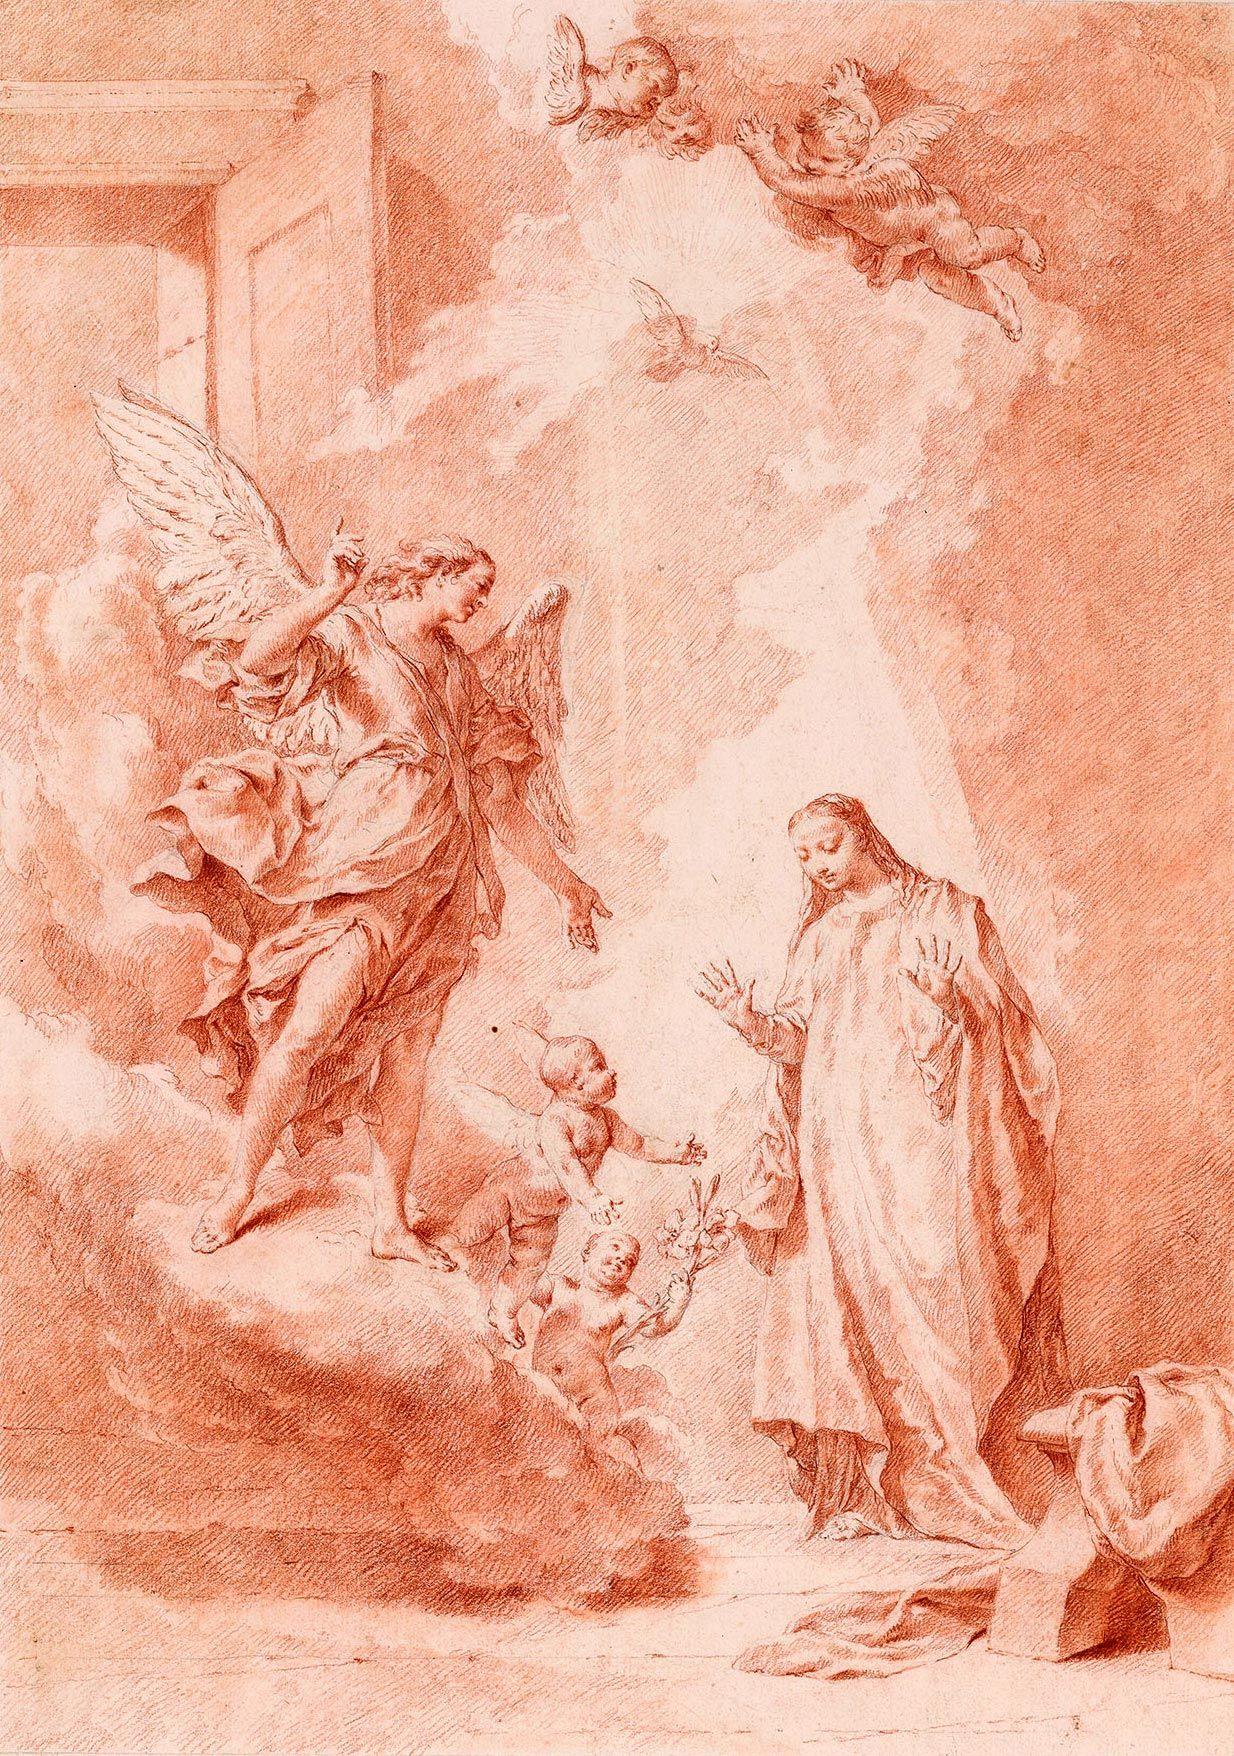 Giovanni Battista Piazzetta | 1682-1754 | Immaculate Conception | The Morgan Library & Museum